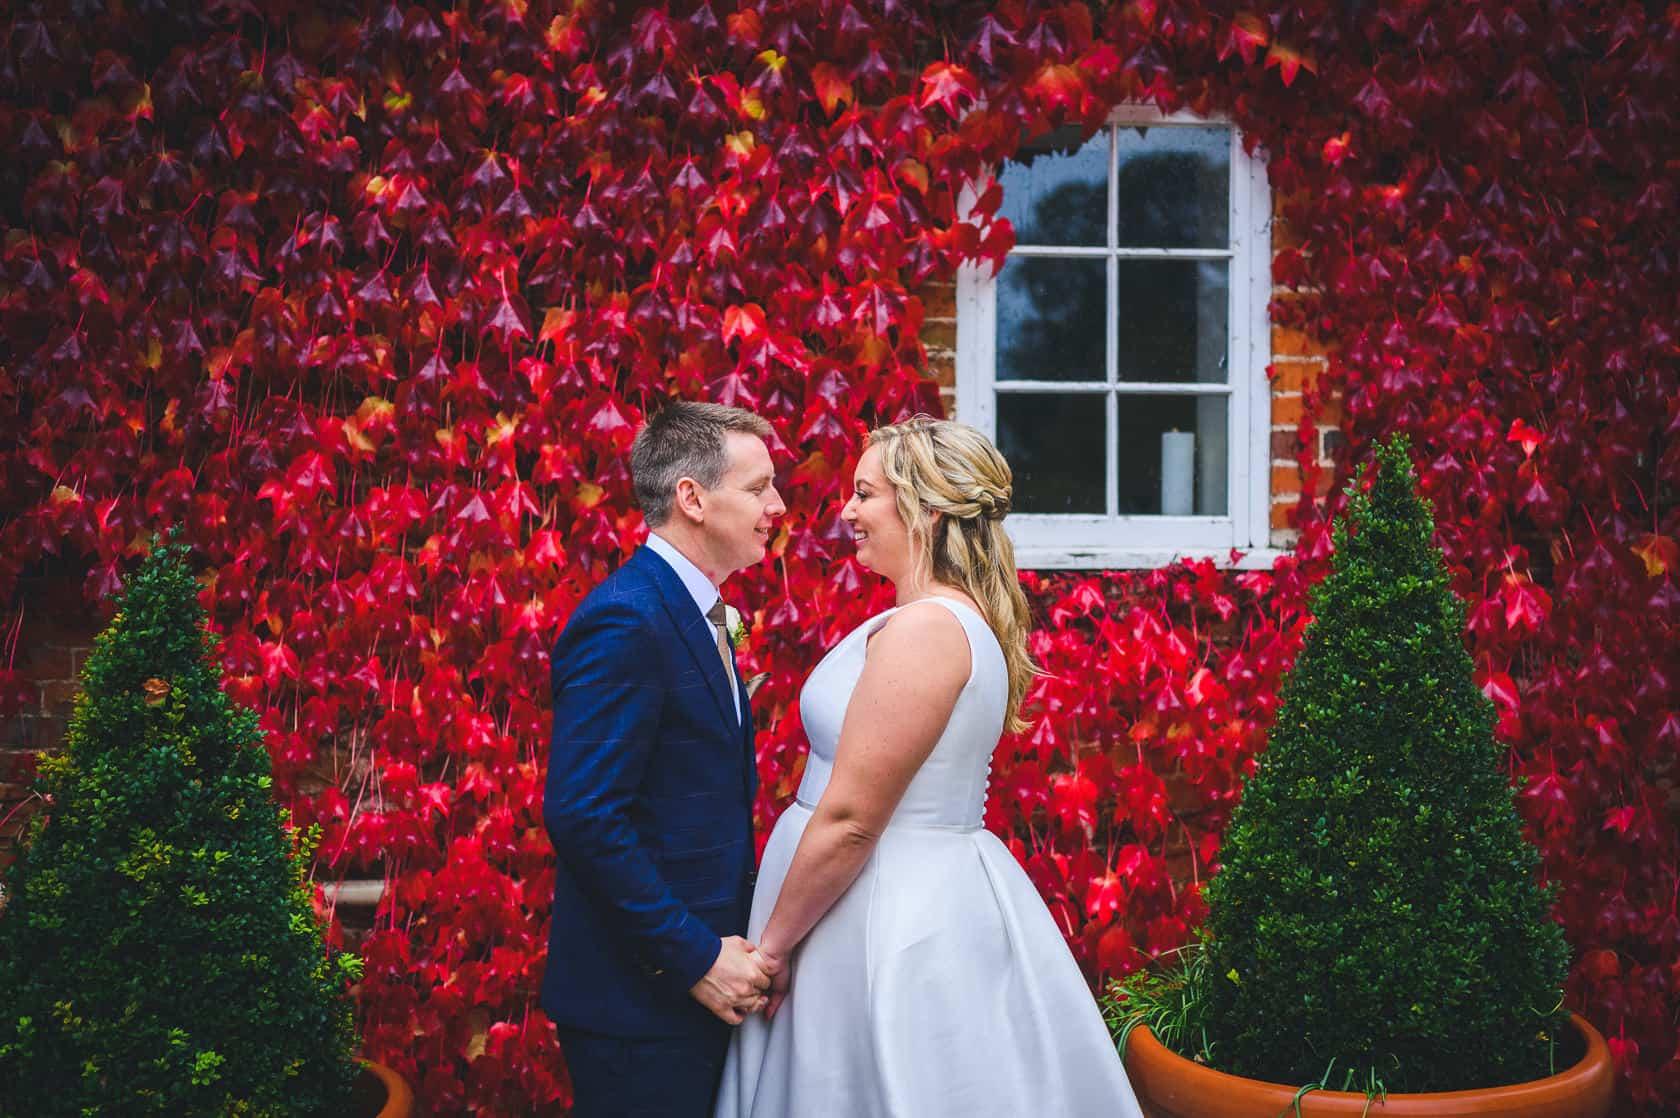 Best_Wedding_Photography_2019_Wedding-Photographer-Essex_005